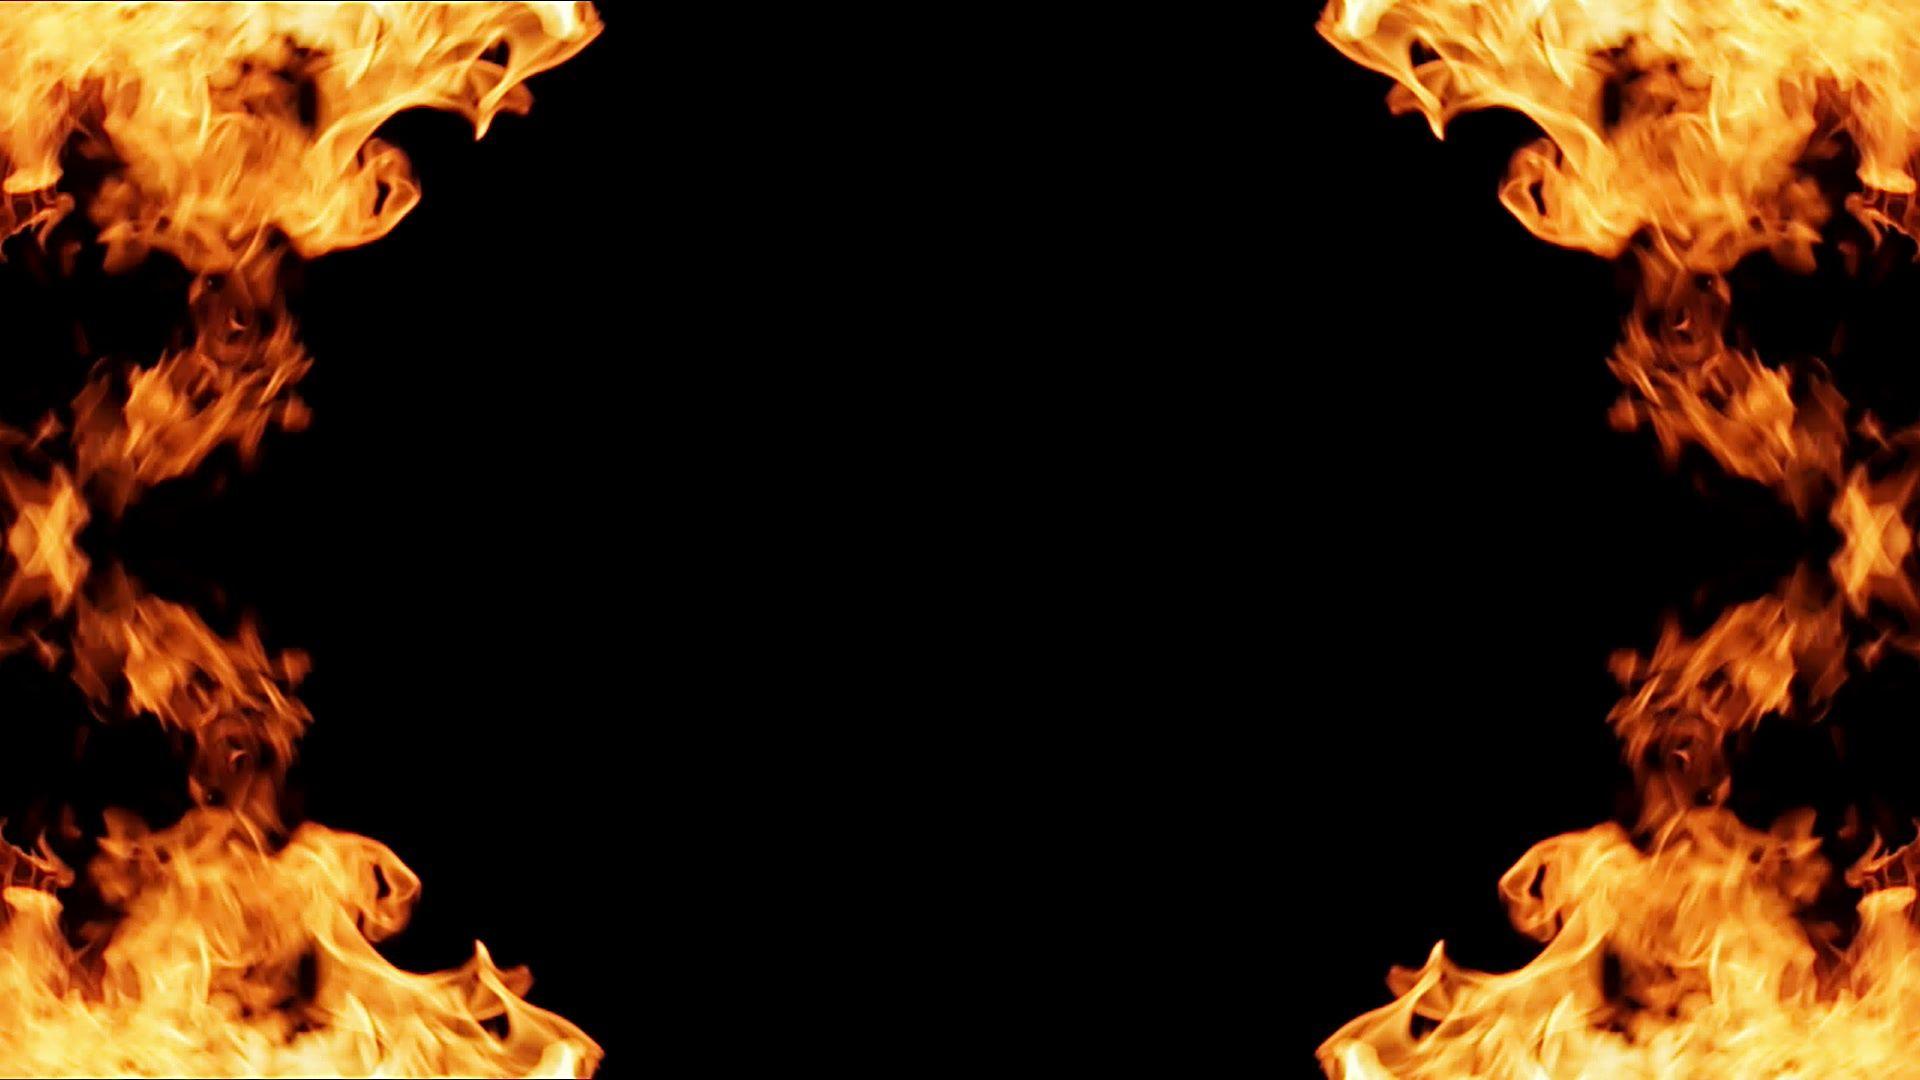 Frame of fire on black background Stock FootageblackfireFrame 1920x1080